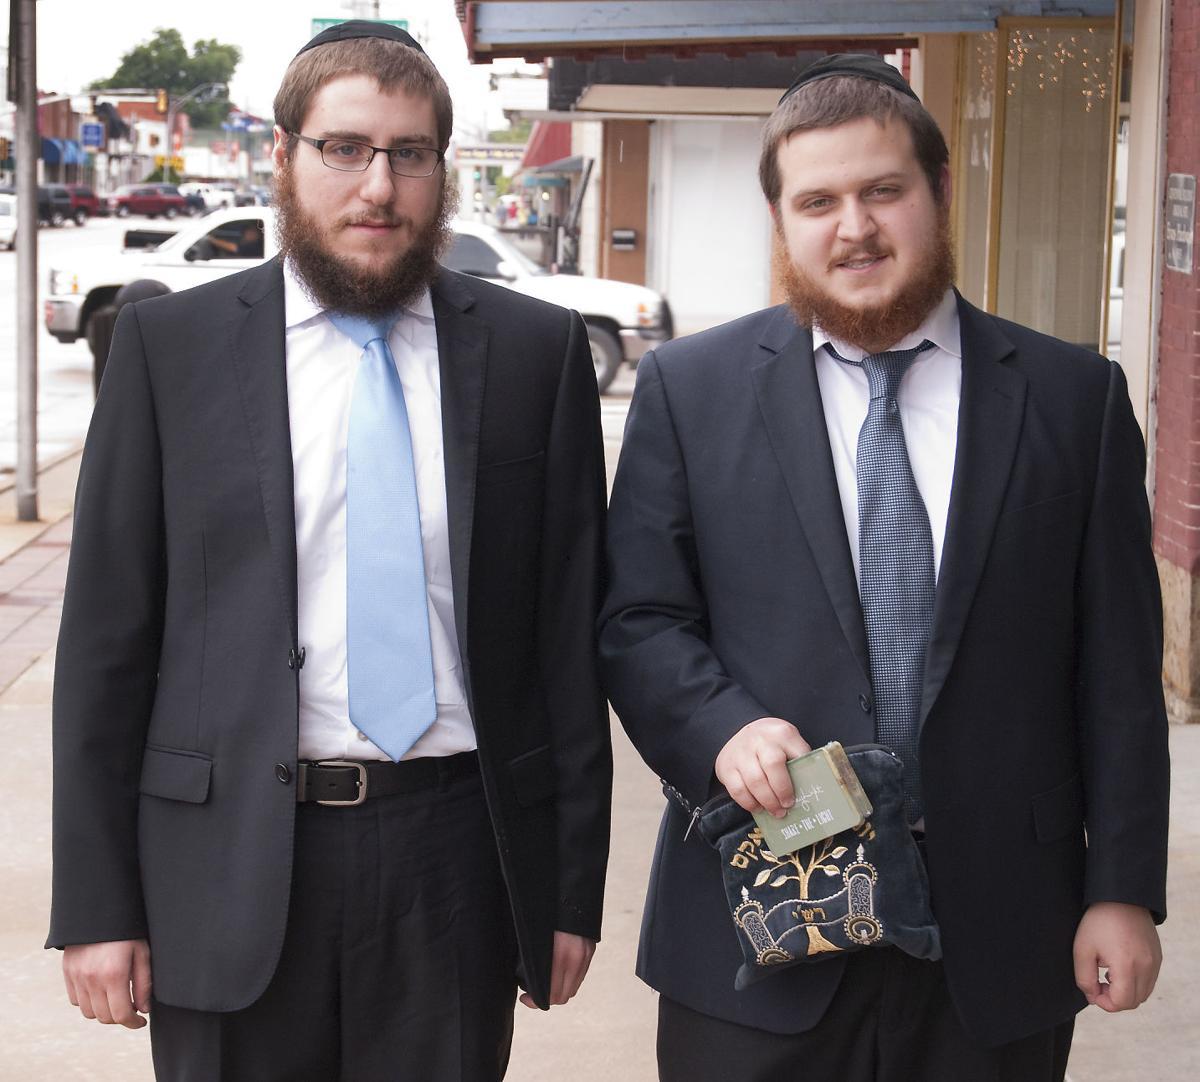 Roving Rabbis 07-30-14c.jpg